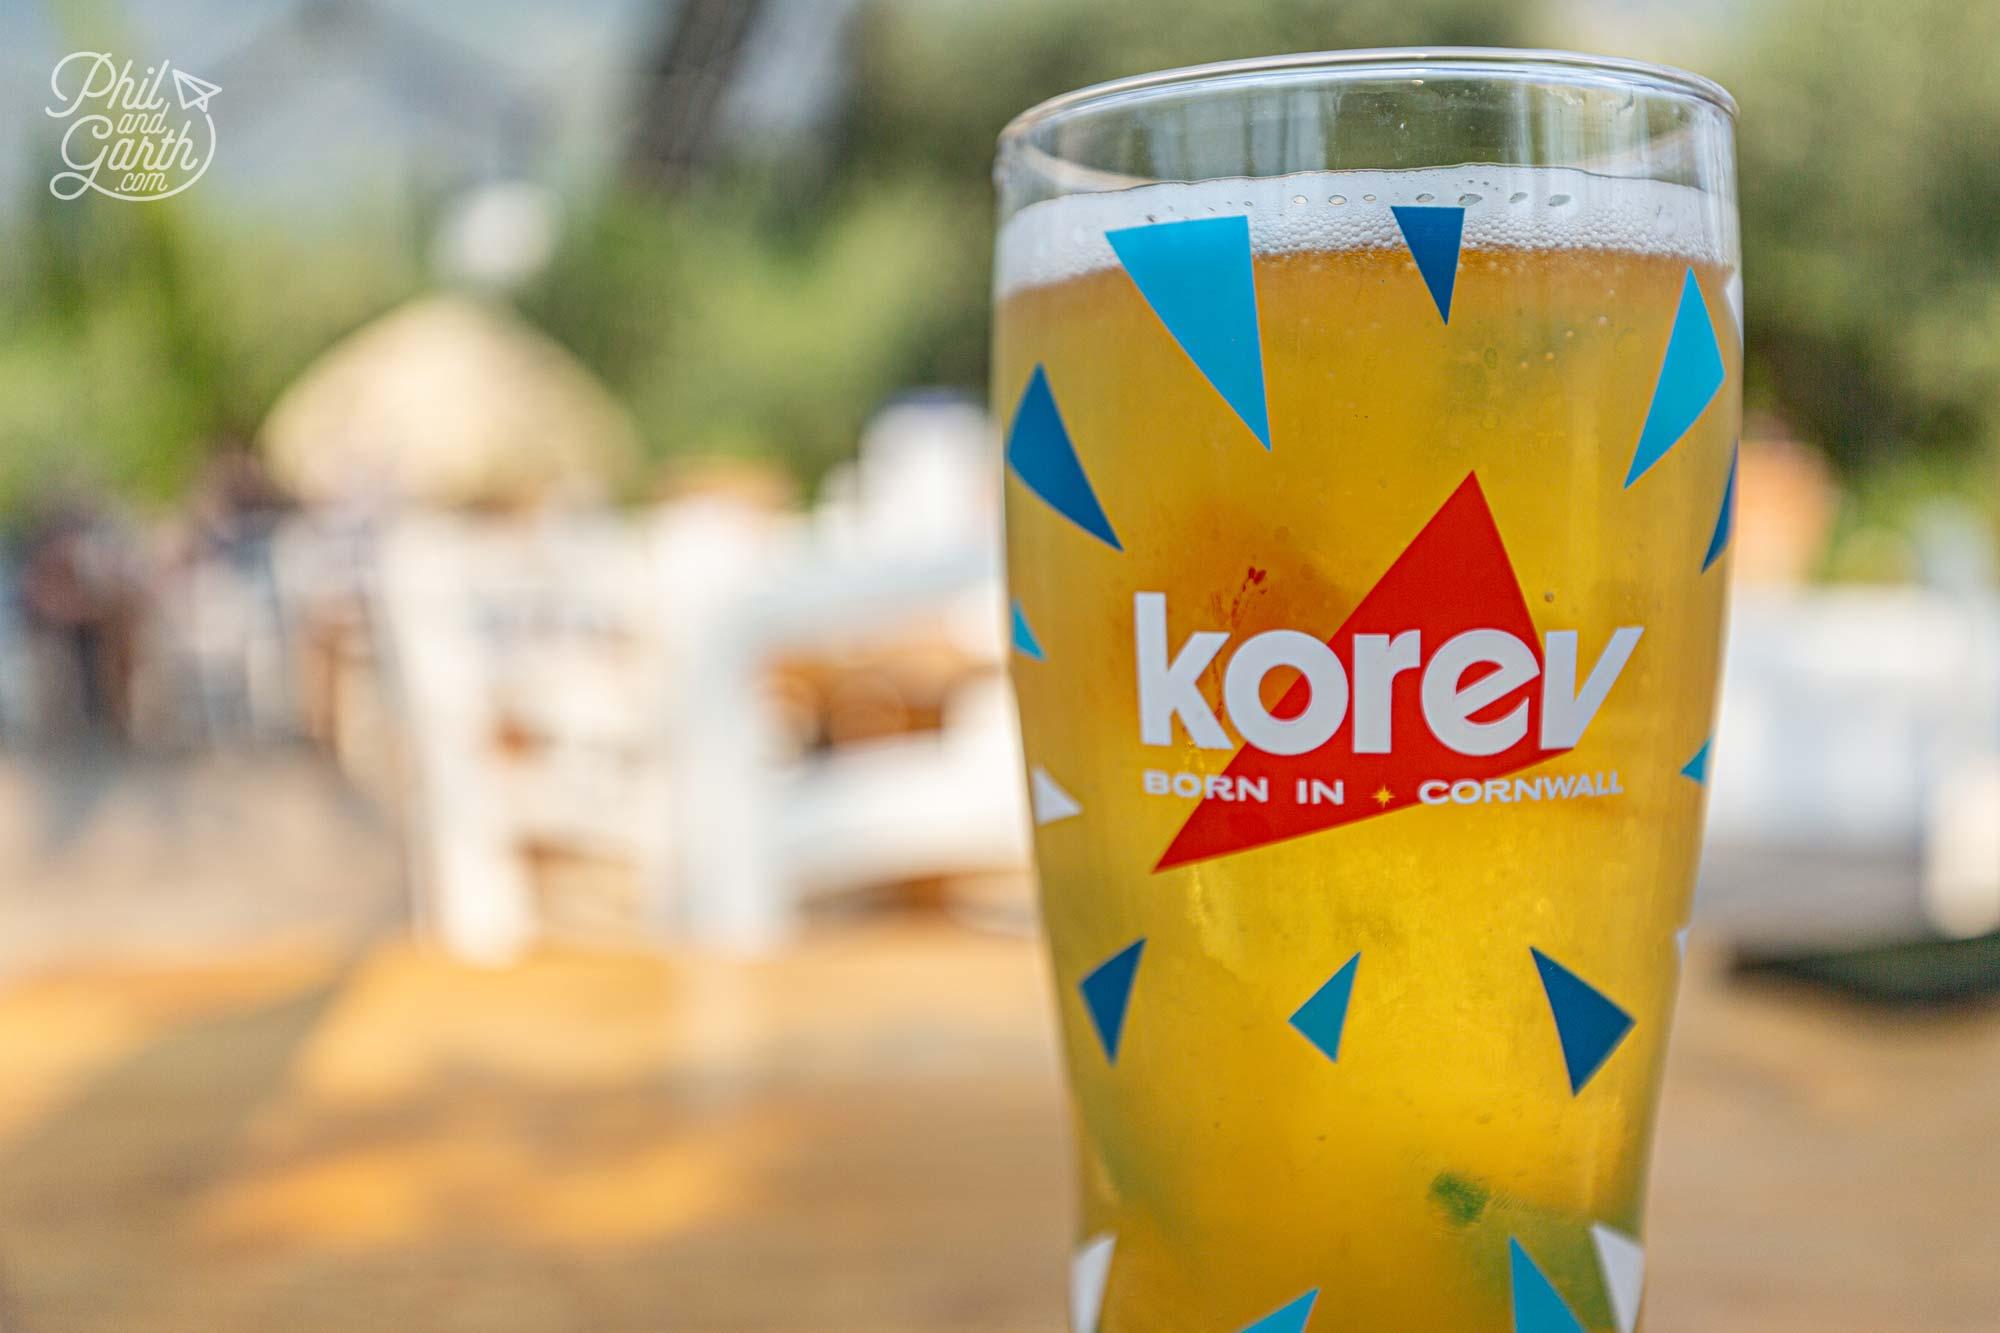 Korev - Cornwall's locally brewed beer